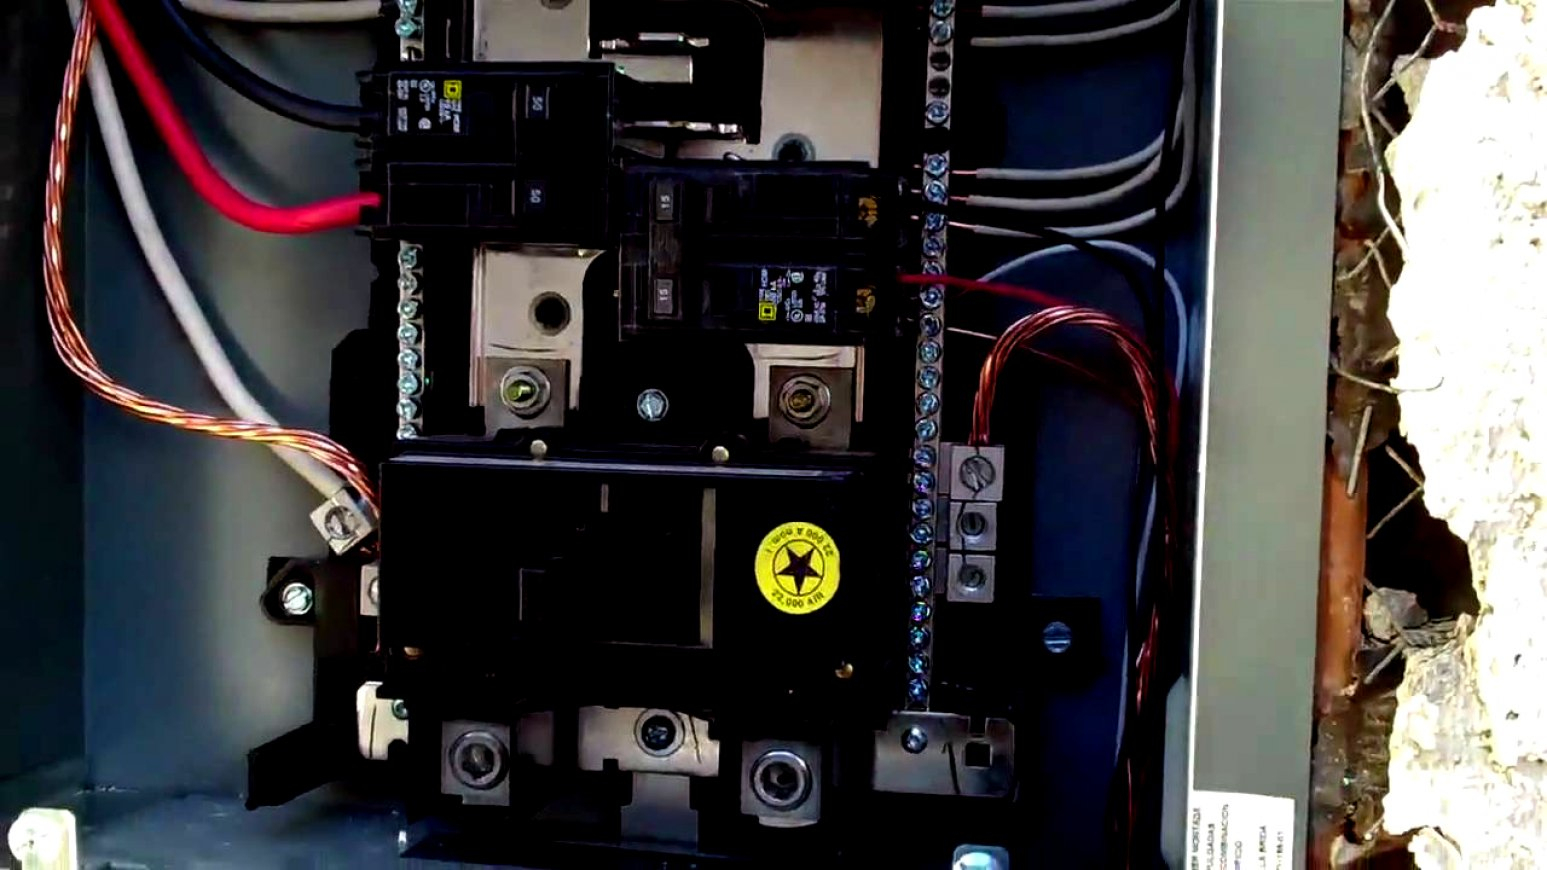 Square D Panel Breaker Box Wiring Diagram - Trusted Wiring Diagram - Square D Breaker Box Wiring Diagram